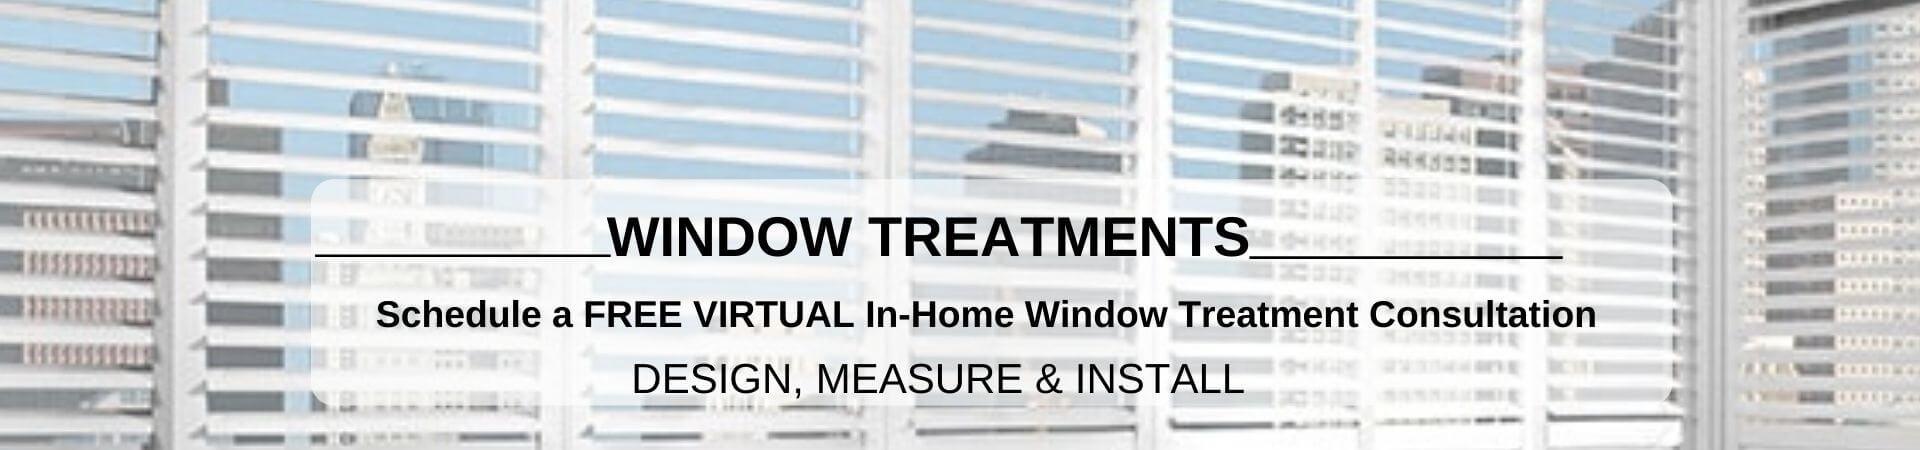 window treatments_